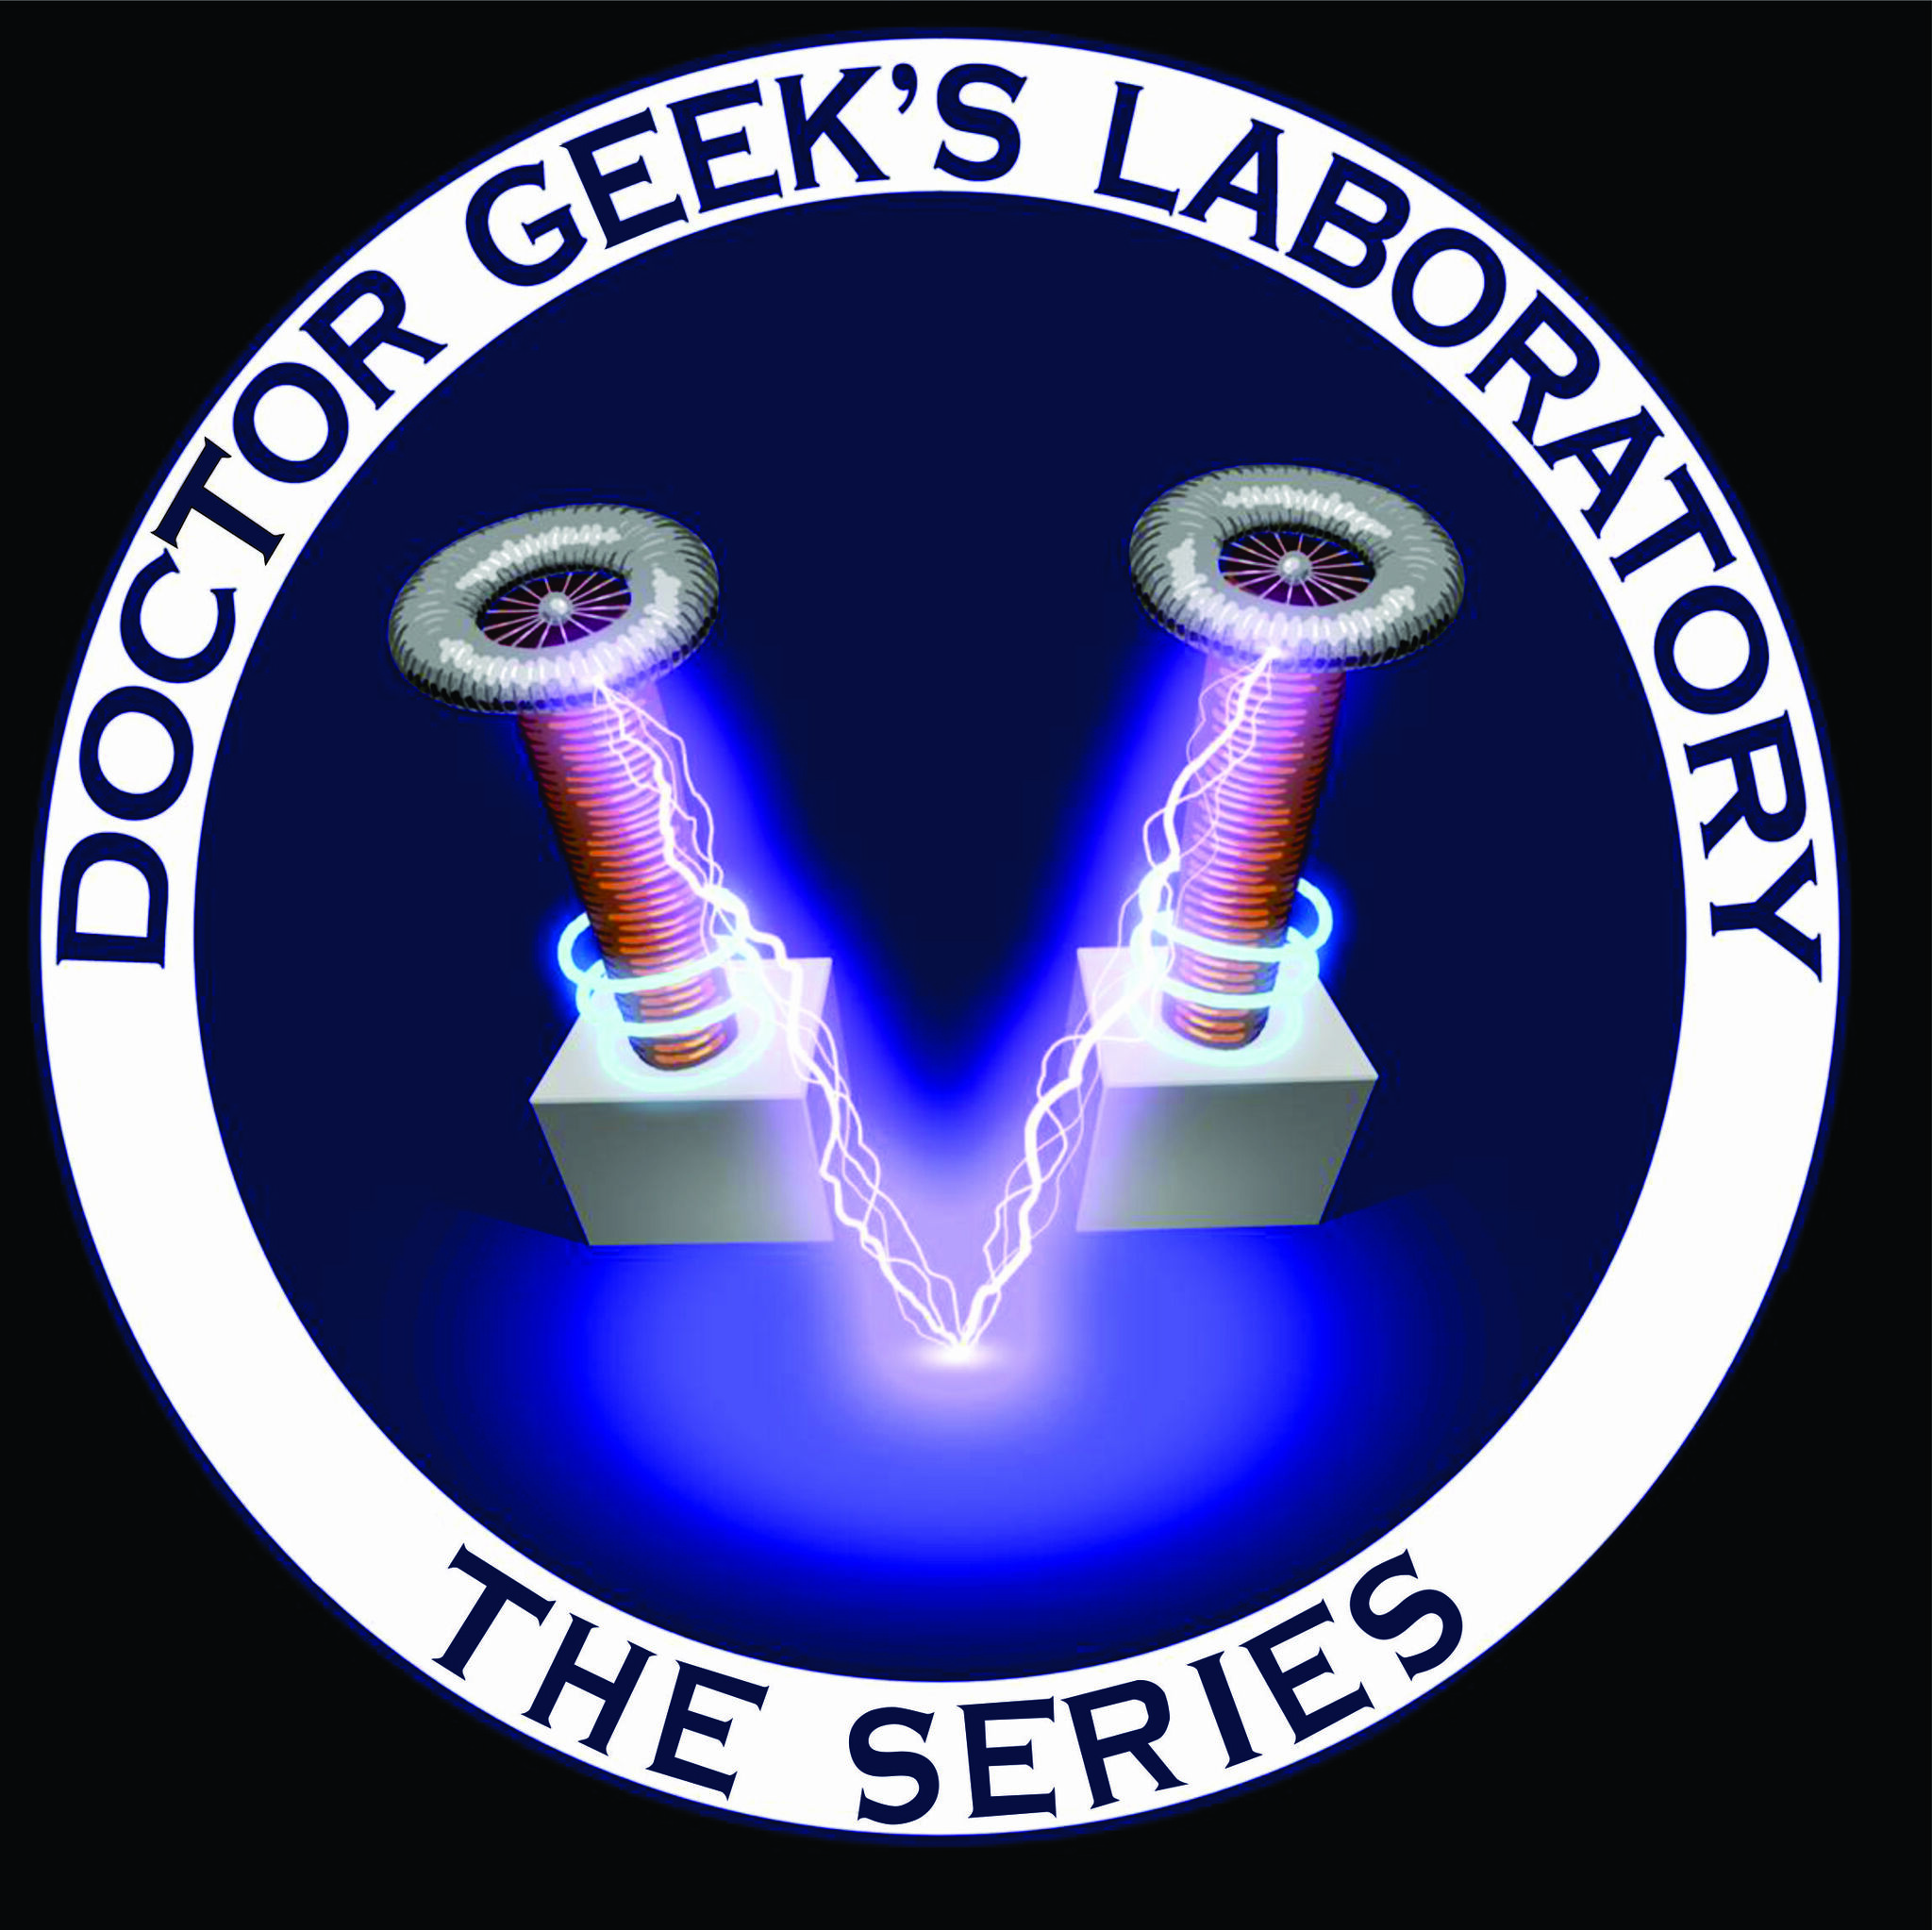 Doctor Geek's Laboratory of Applied Geekdom